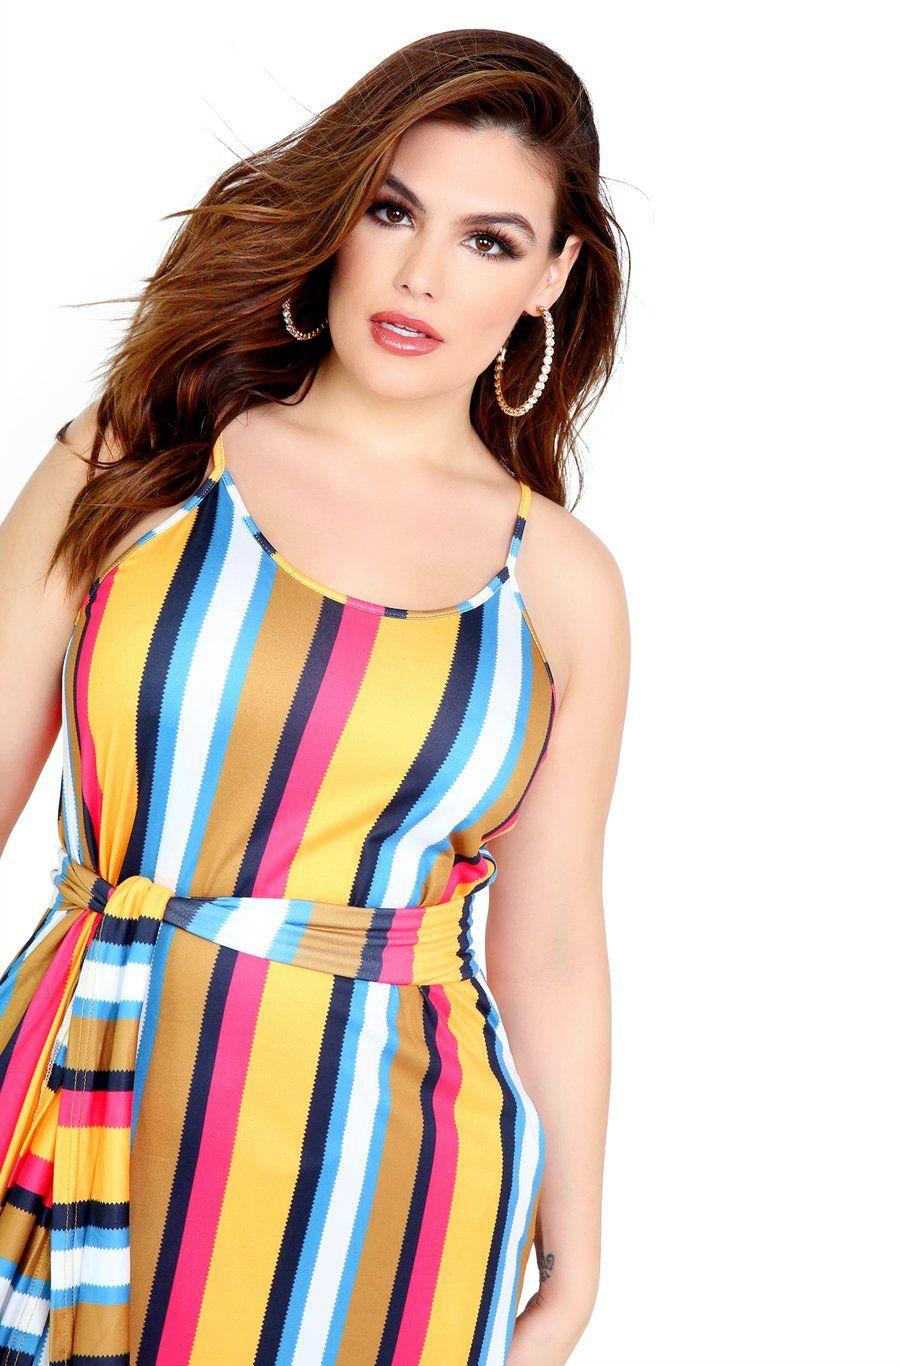 Orange Striped Maxi Dress W Pockets Available In Both Missy And Plus Sizes Shop Rebdolls For The Latest In Trendy Affordable Moda Vestidos De Moda De Moda [ 1366 x 900 Pixel ]